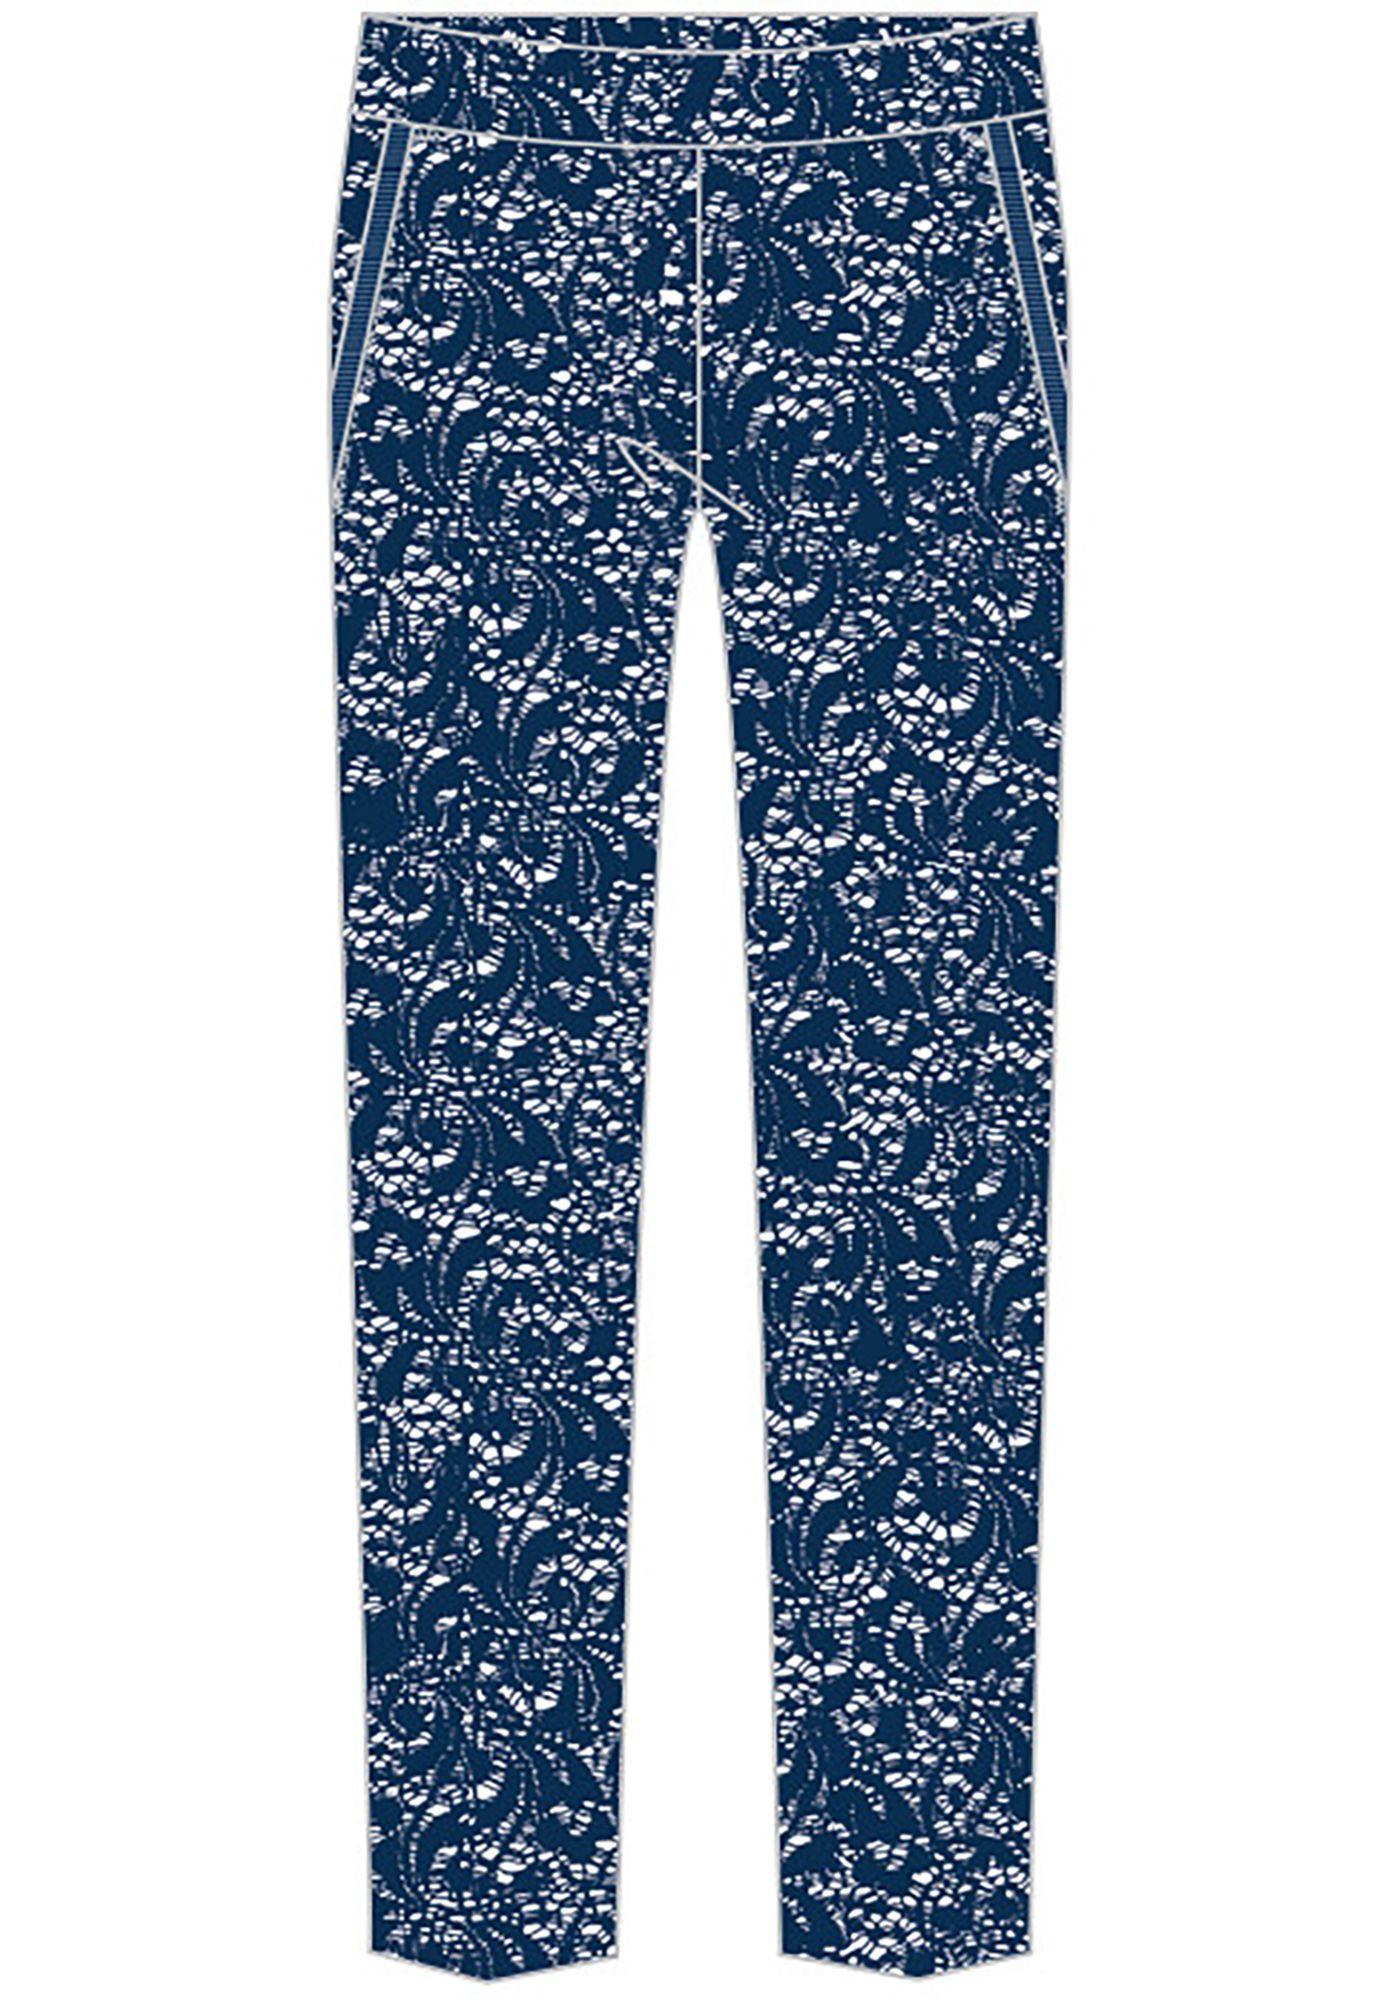 "EP Pro Women's 29.5"" Inseam Ankle-Length Golf Pants"